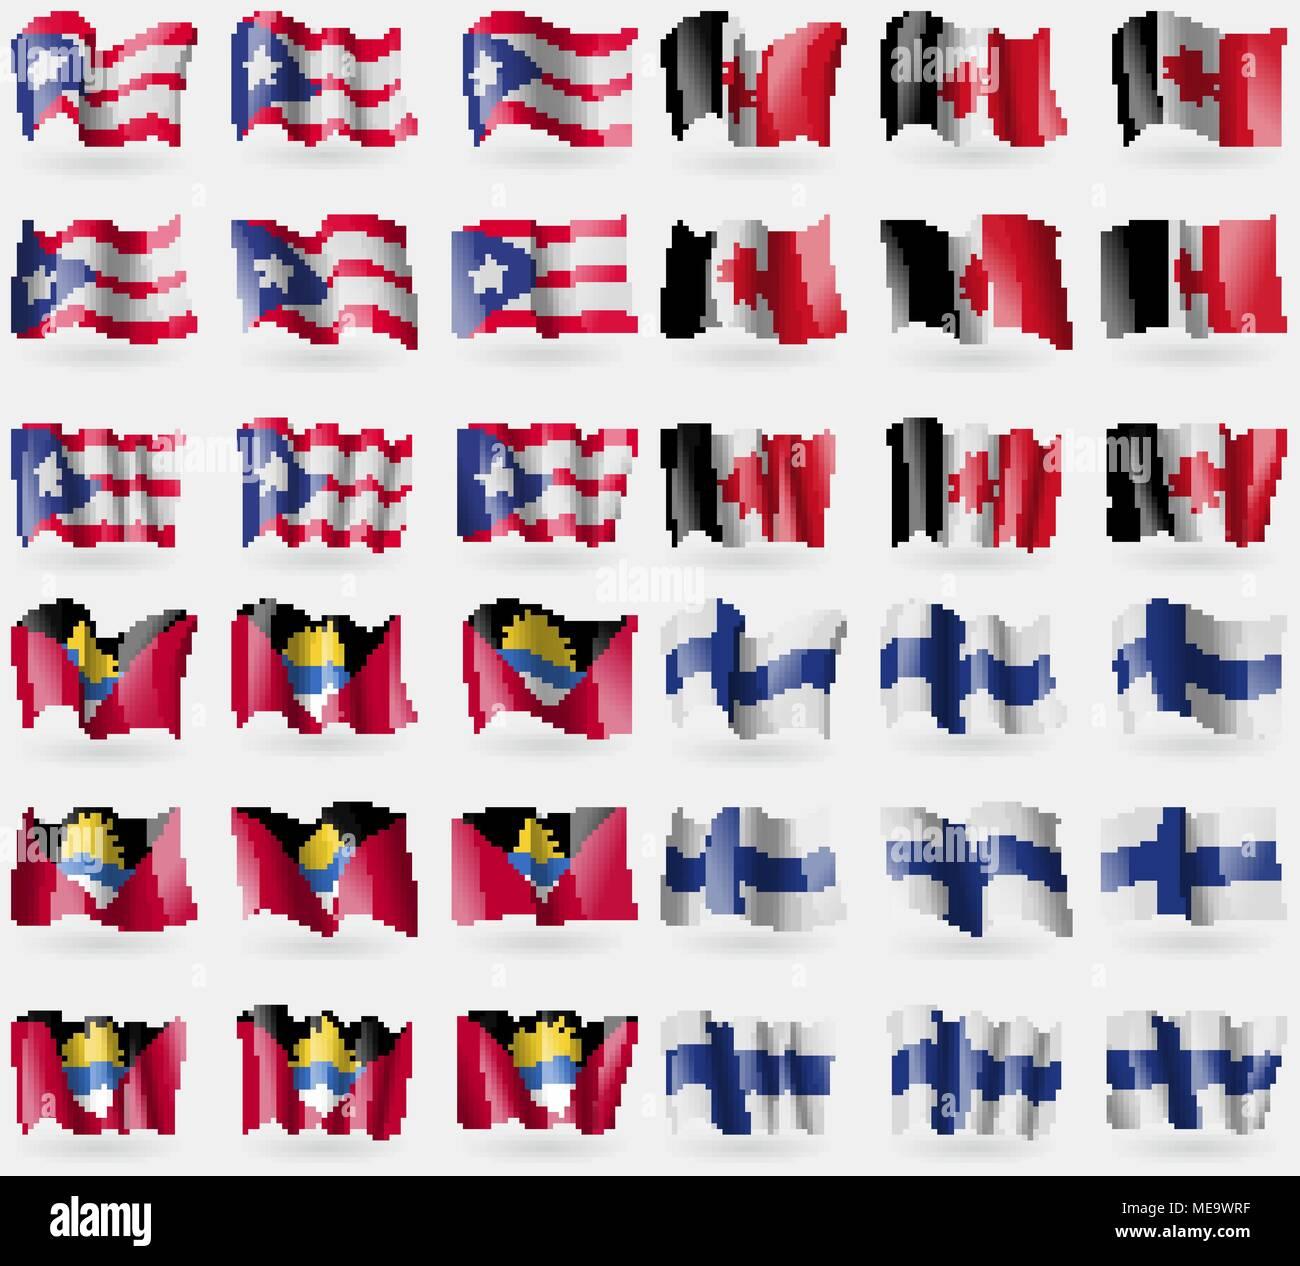 Großzügig Texas Flagge Färbung Seite Bilder - Framing Malvorlagen ...